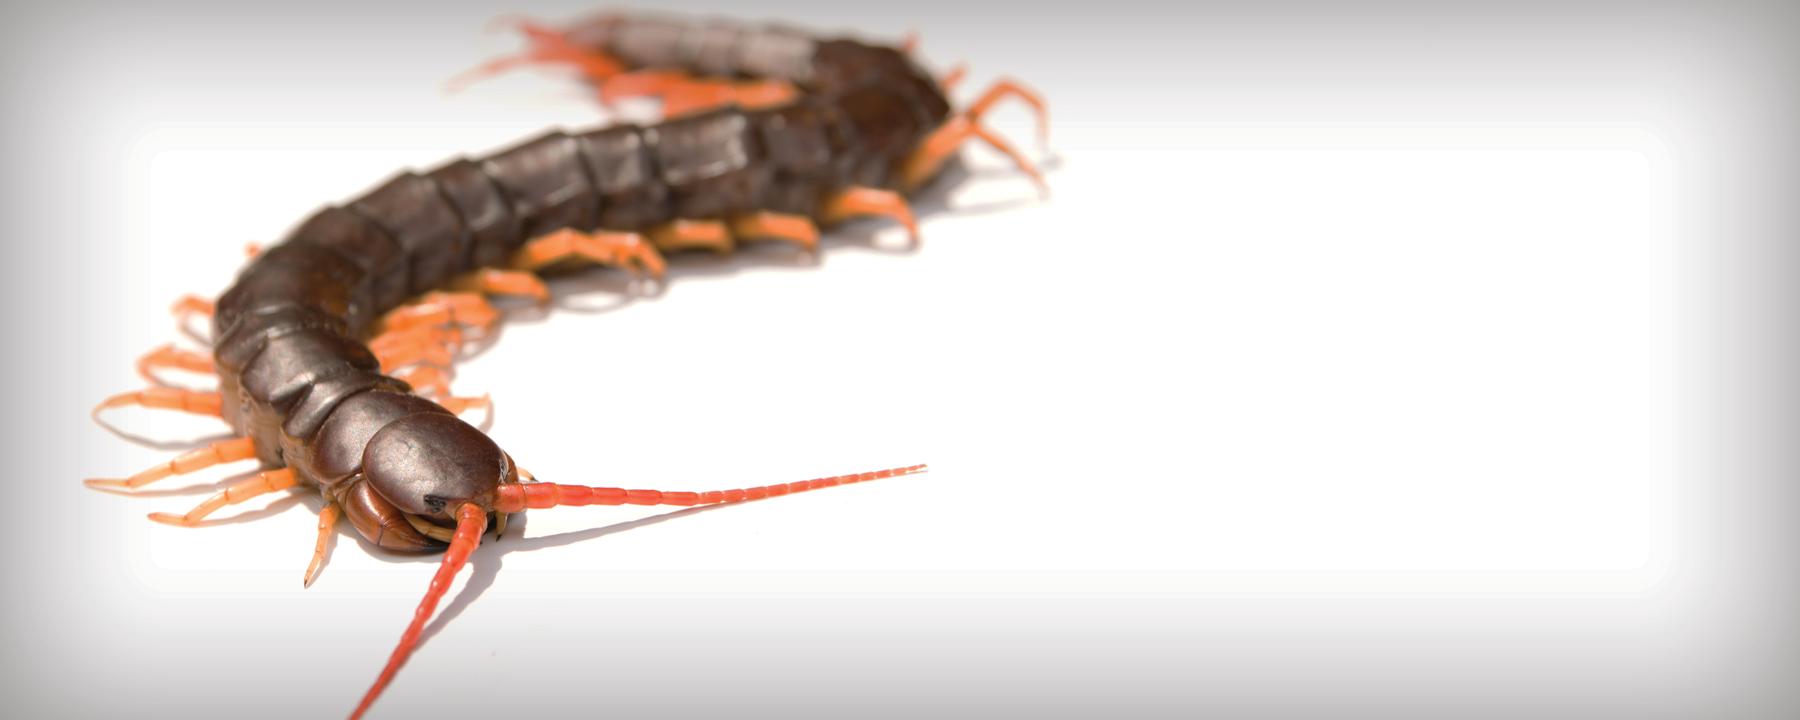 How a Centipede Survives its Own Species' Venom